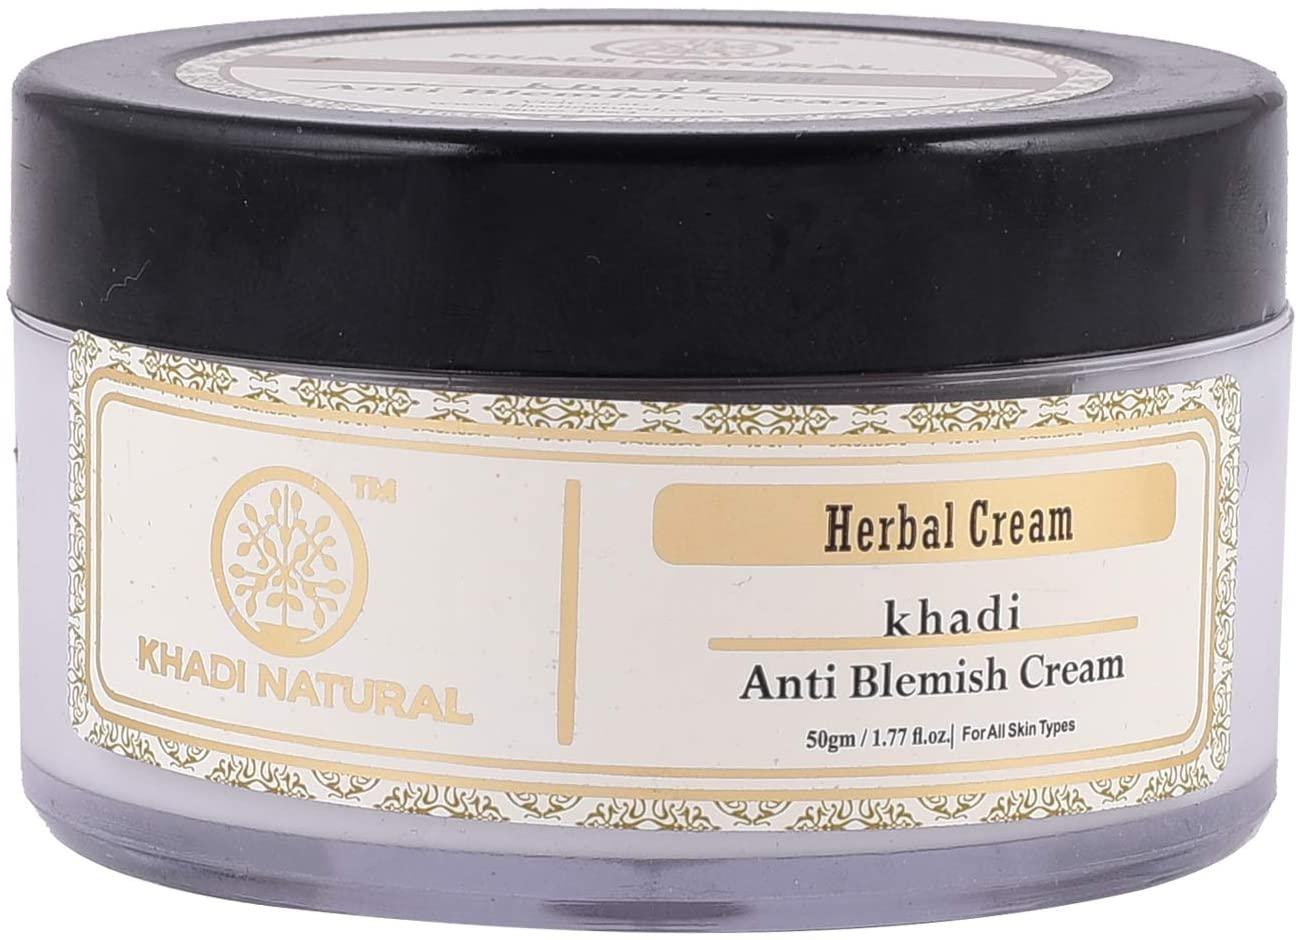 Khadi Herbal Anti Blemish Cream